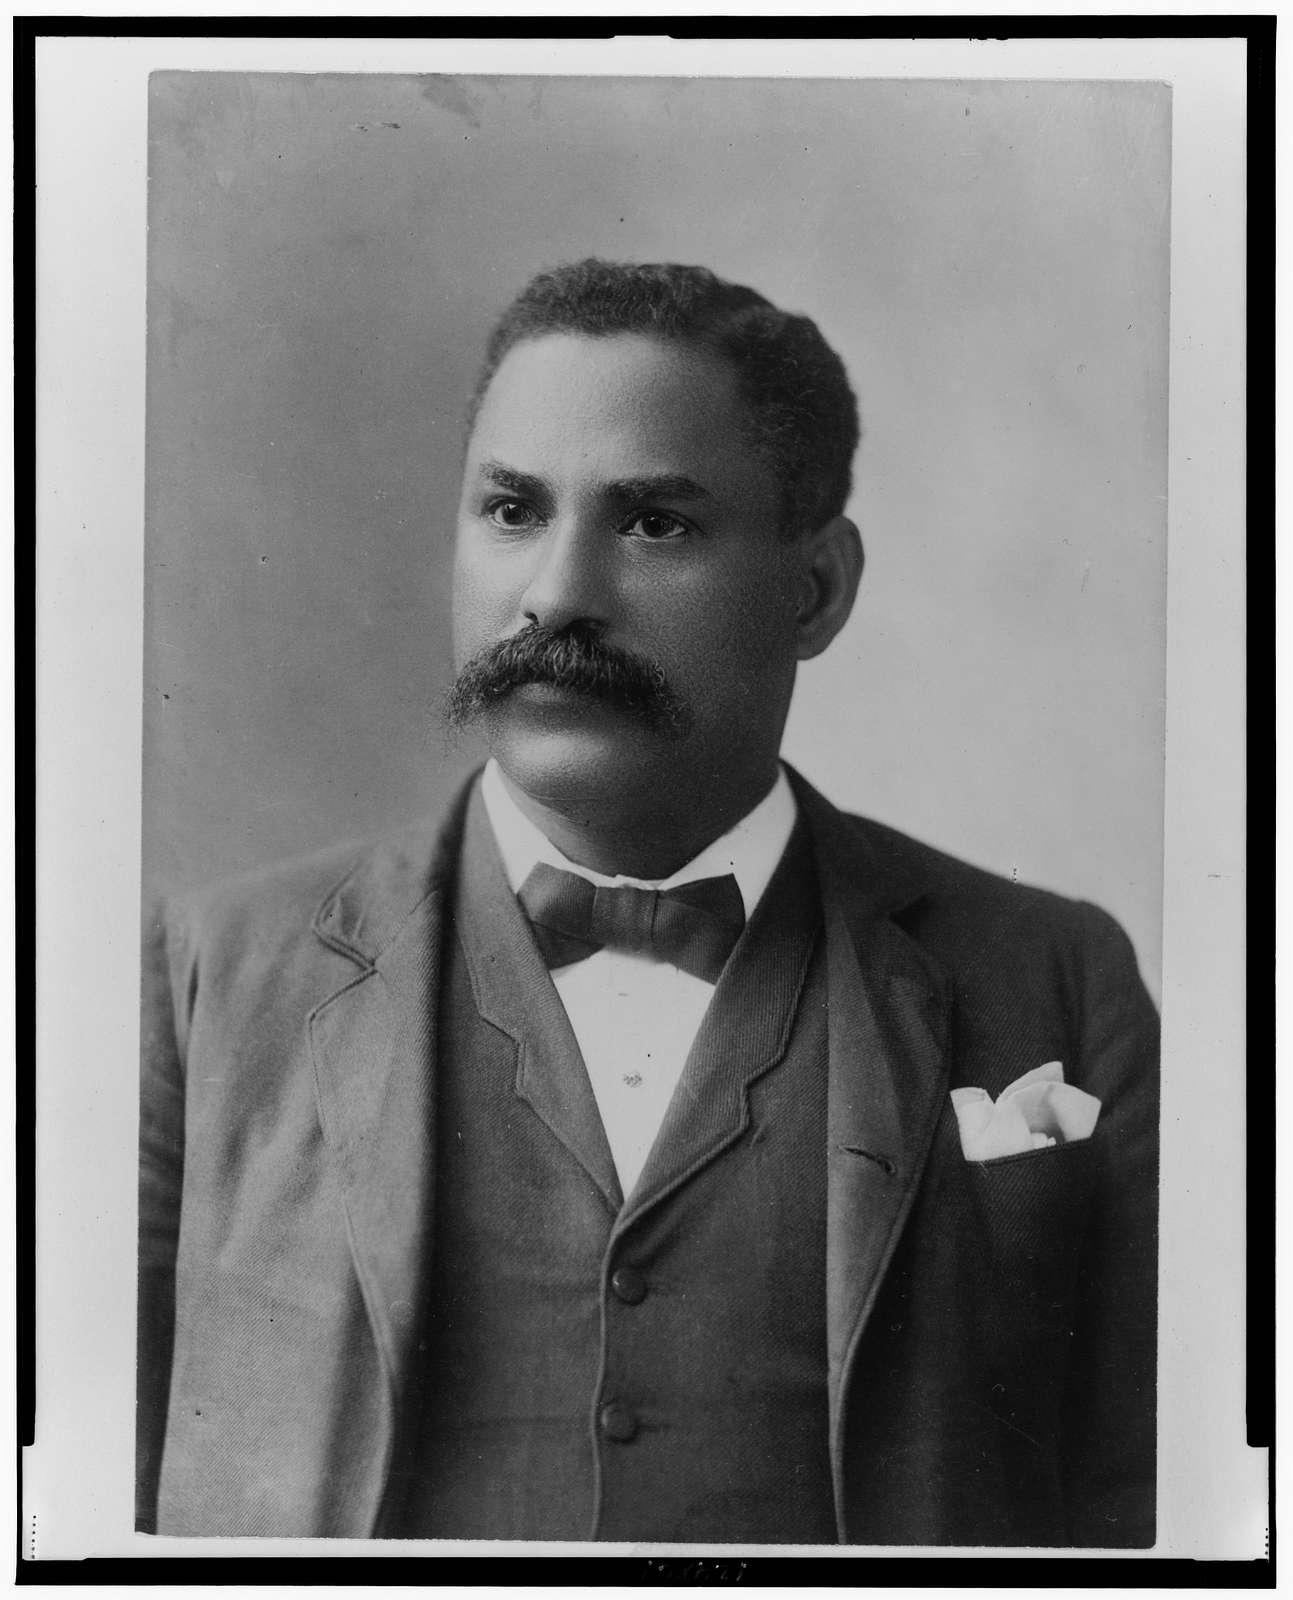 [African American man, half-length portrait, facing slightly left]